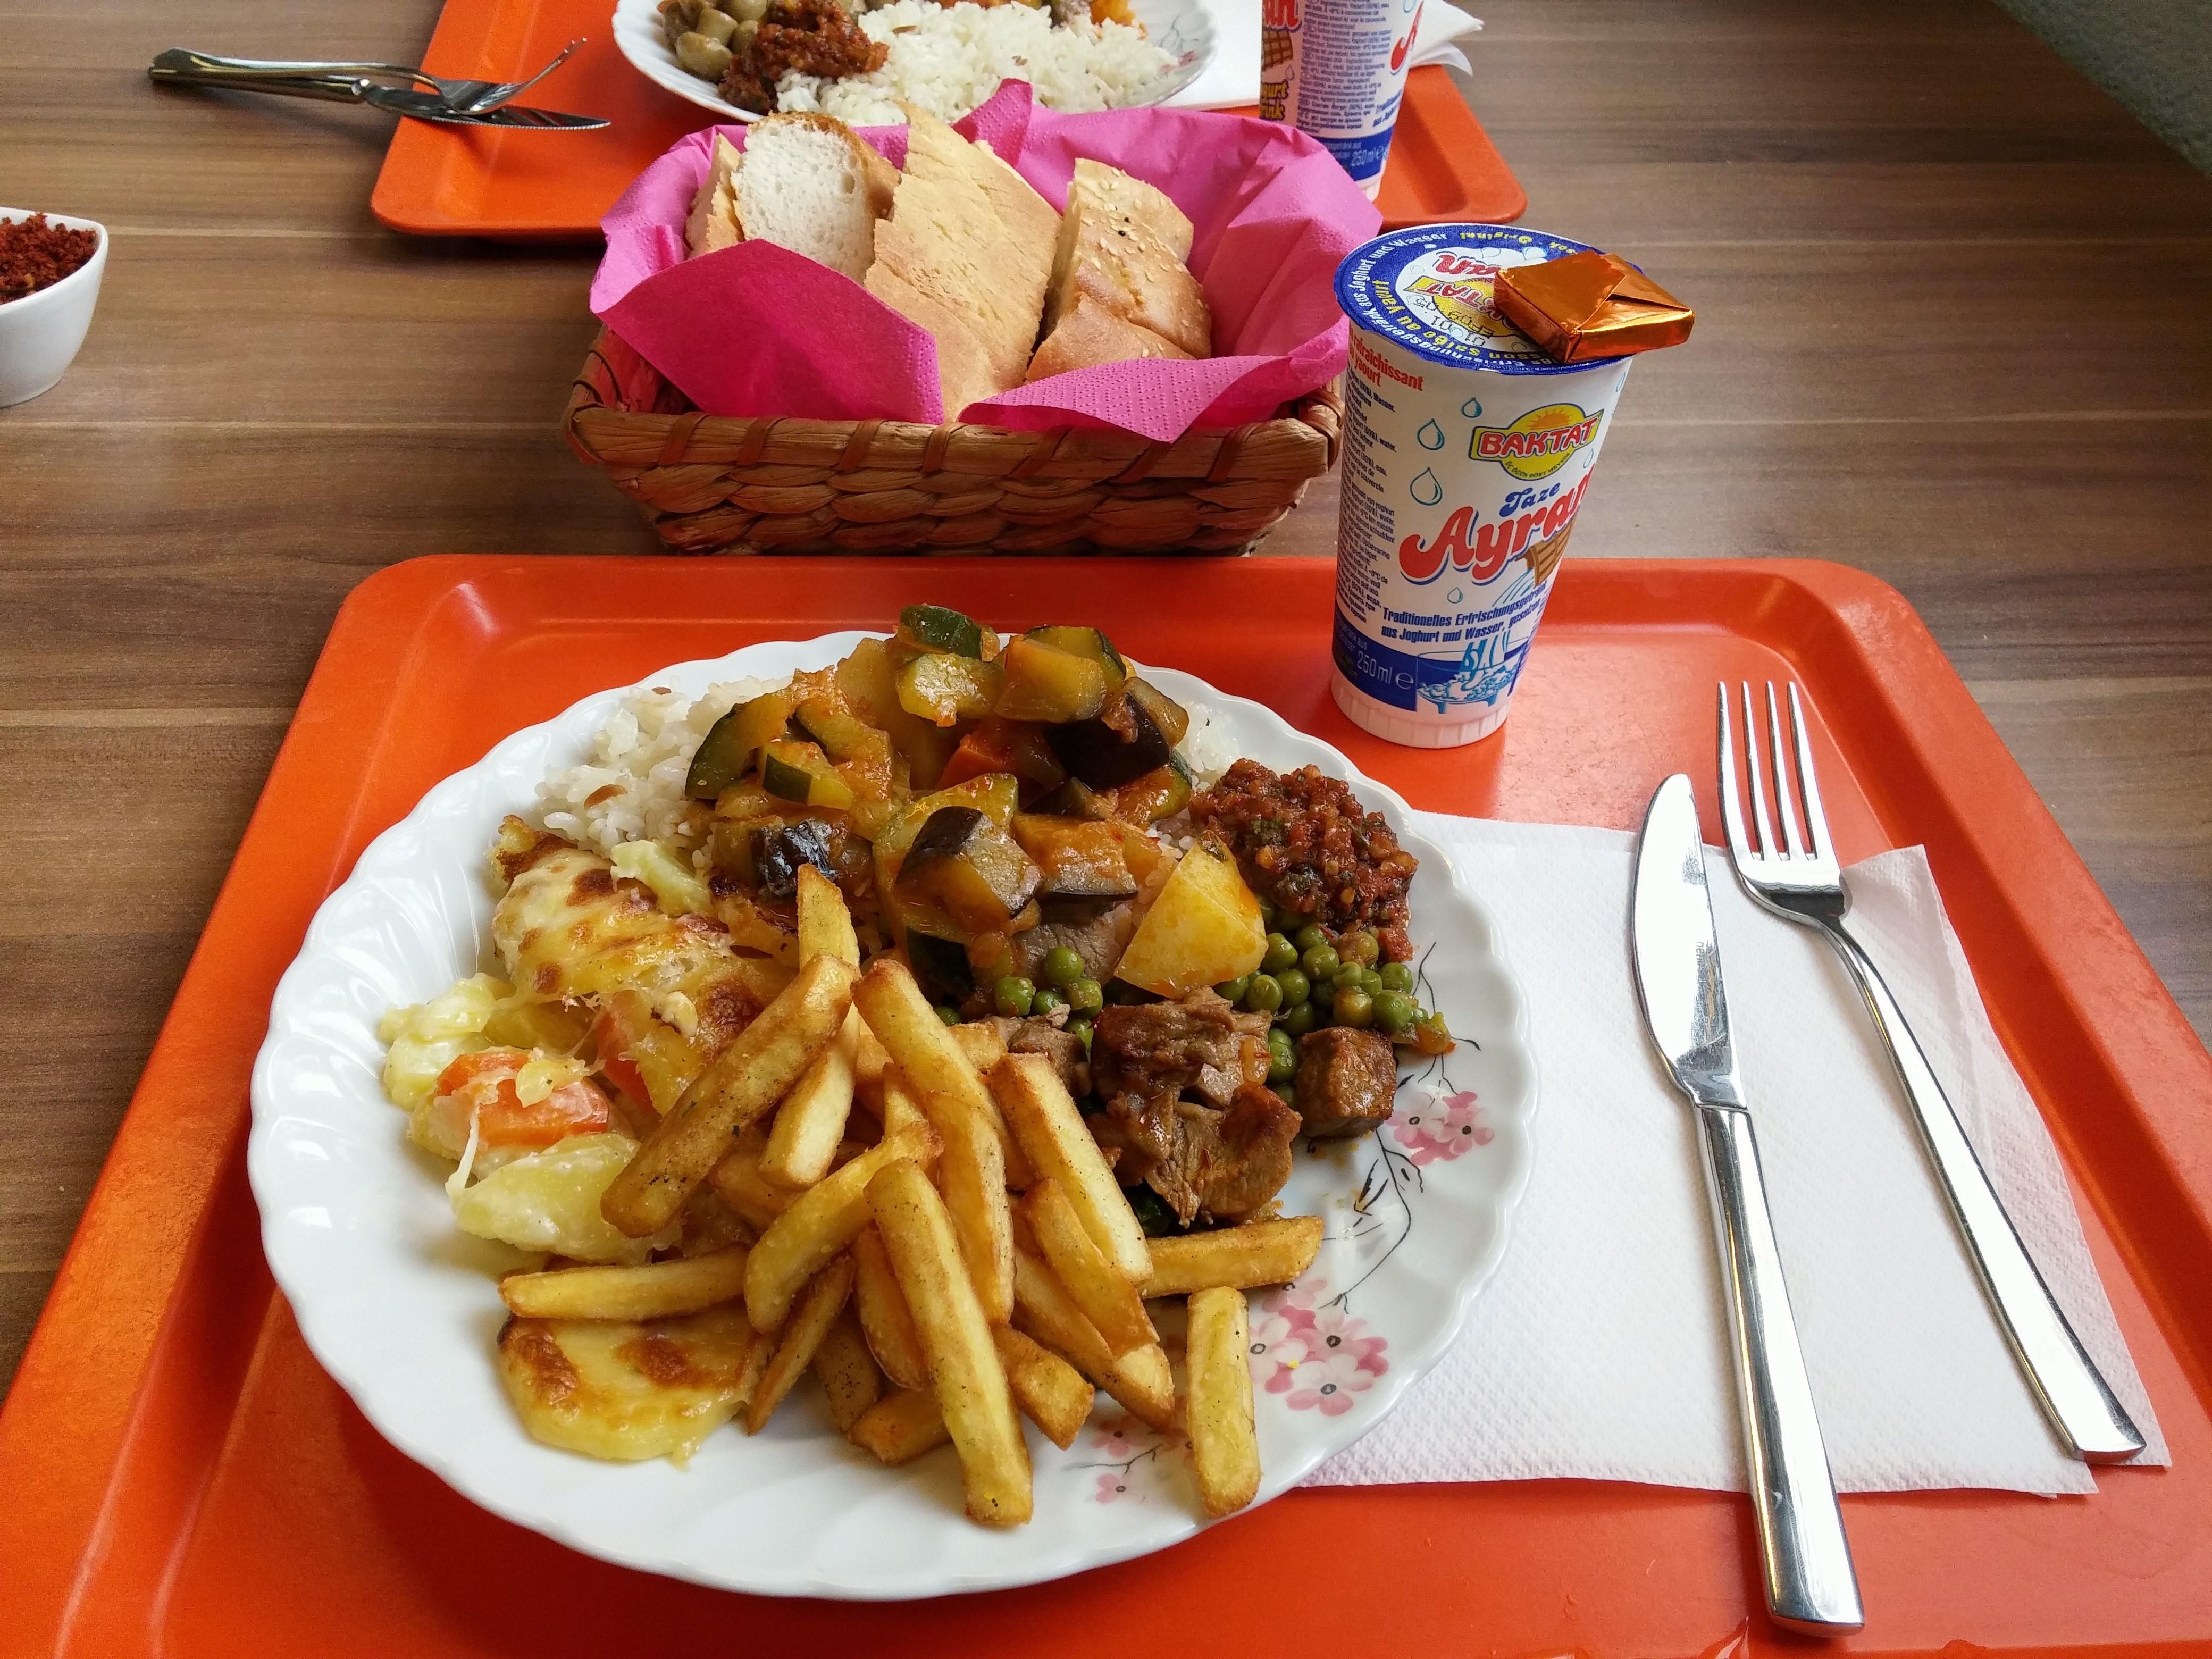 https://foodloader.net/nico_2014-11-21_reis-rindfleisch-kartoffeln-pommes-gemuese-brot.jpg